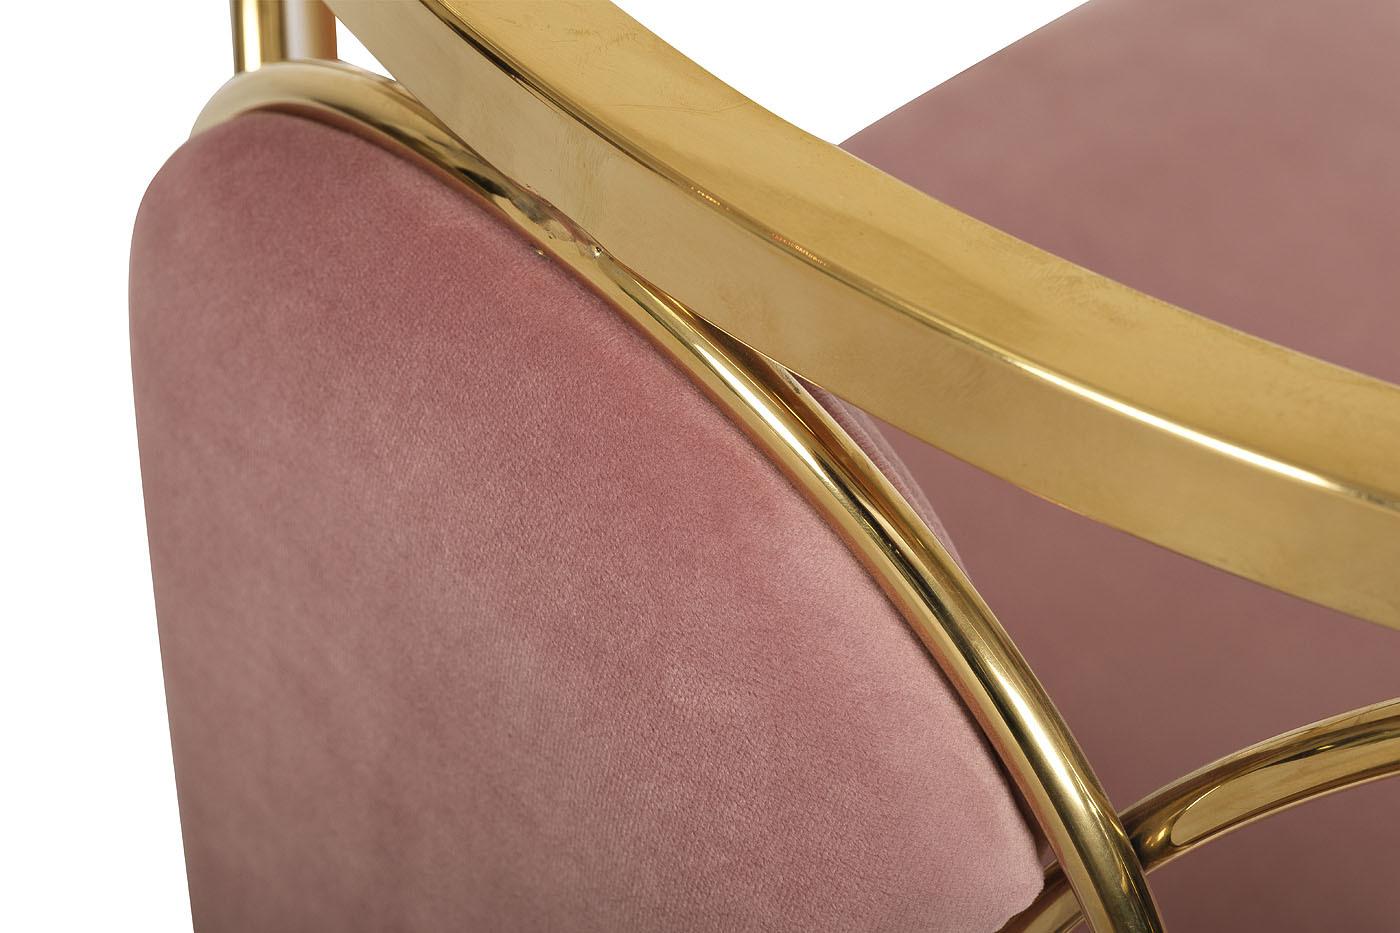 Стул GY-DC8352GOLD-PK золото/велюр розовый 56,5*55*75см